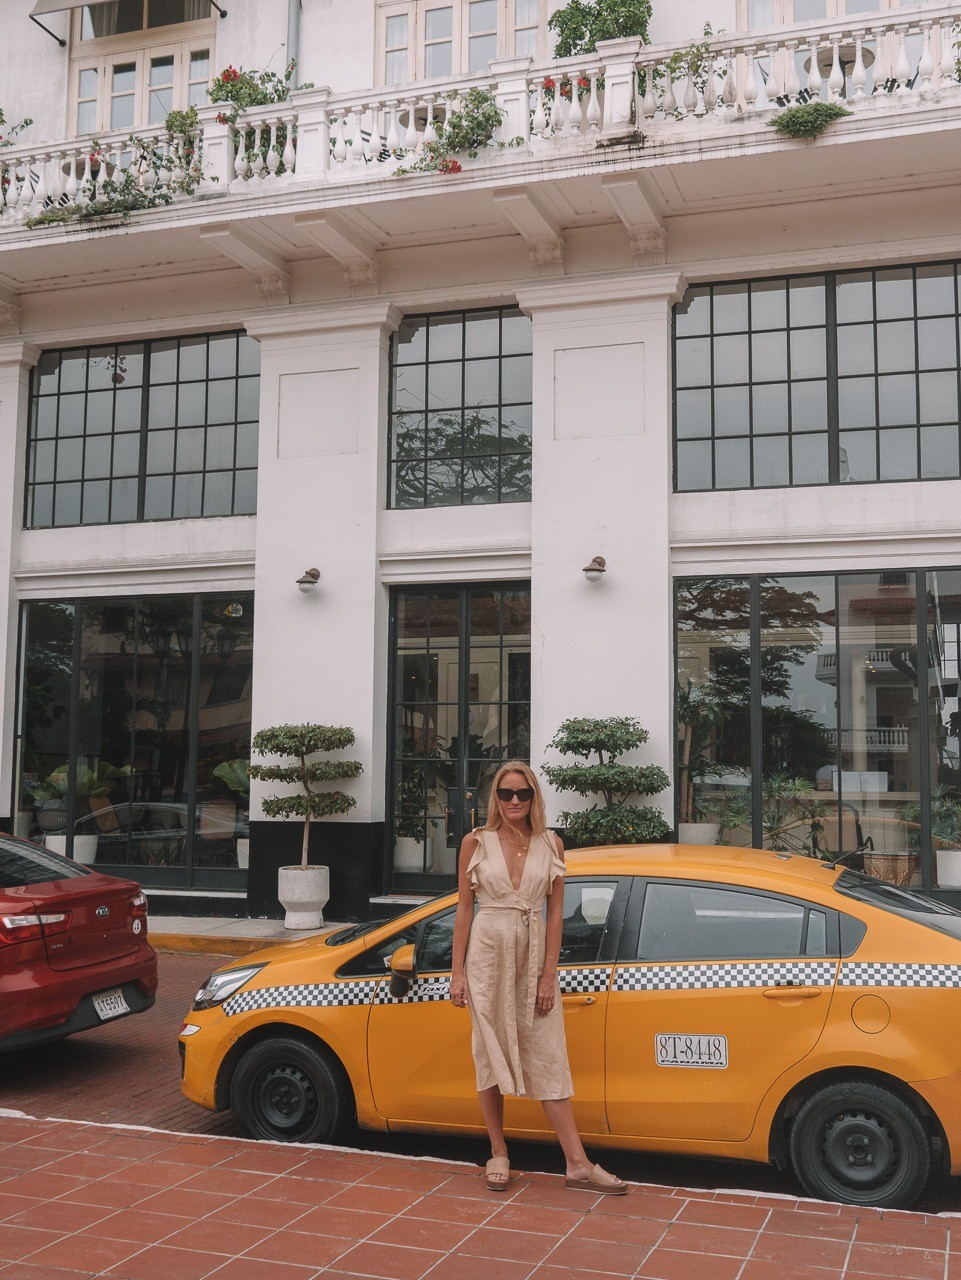 American Trade Hotel Review, Casco Viejo, Panama City